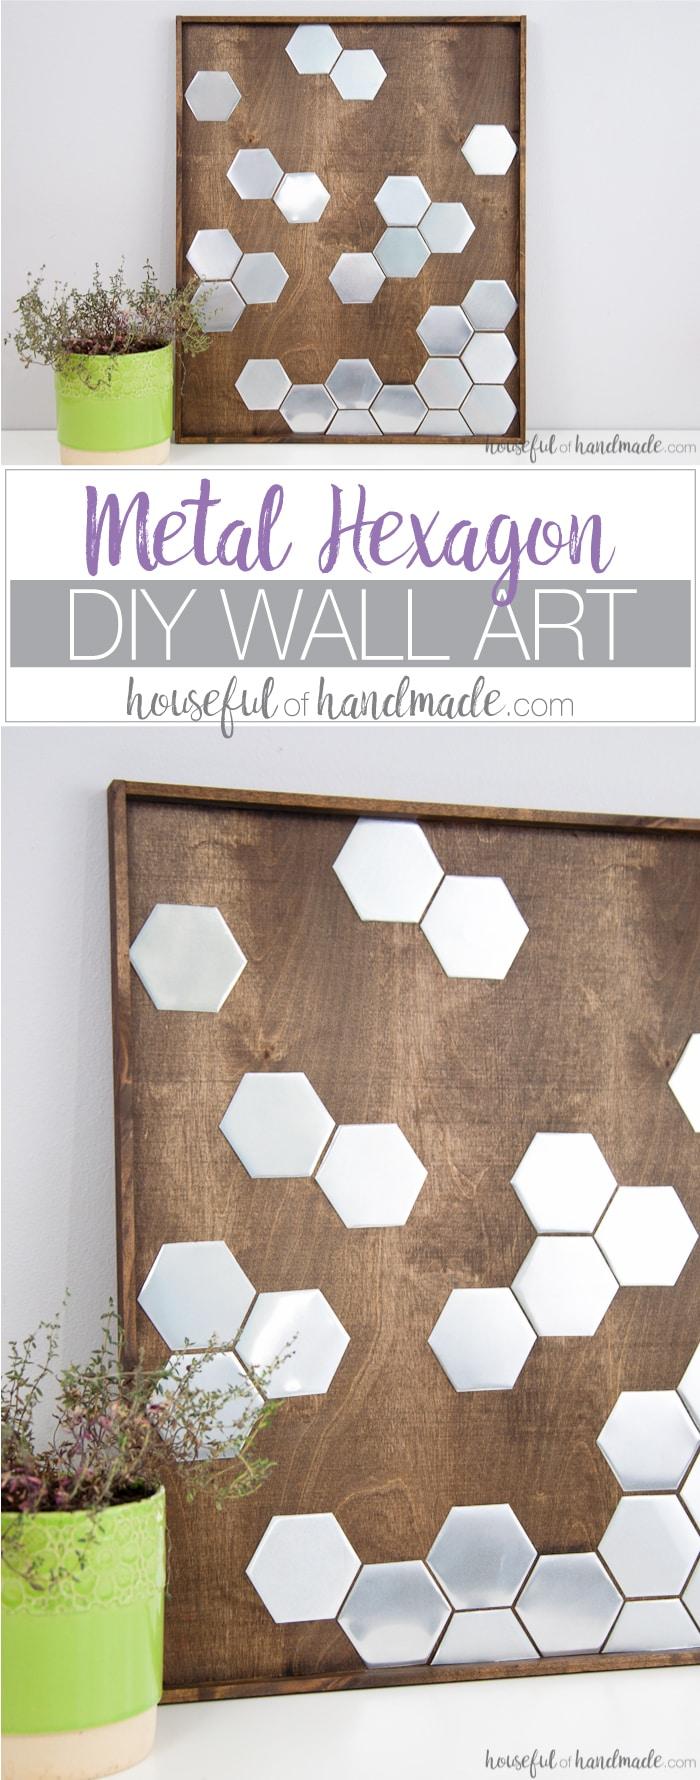 Ways To Use Wood In Diy Wall Art Mathwatson - Samsung-ziepel-e-diary-refrigerator